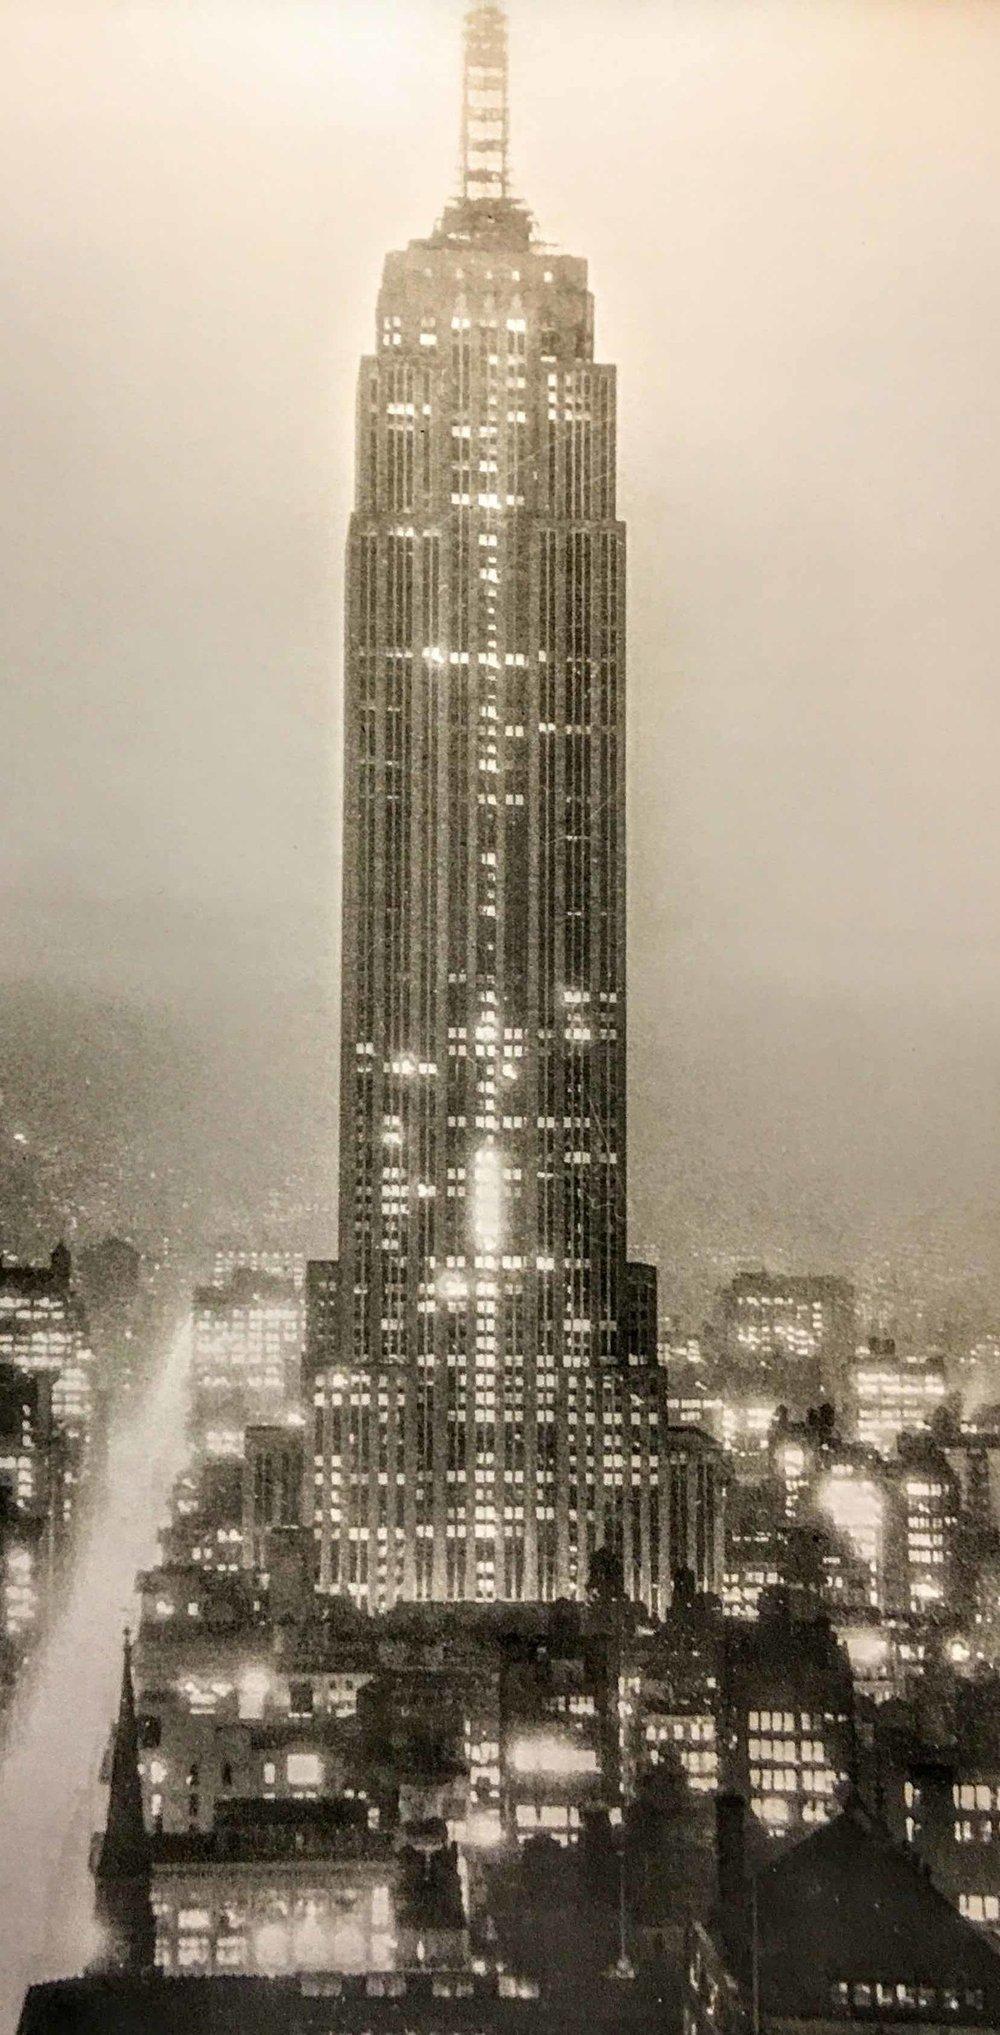 FOTO: LEWIS HINE, 1930